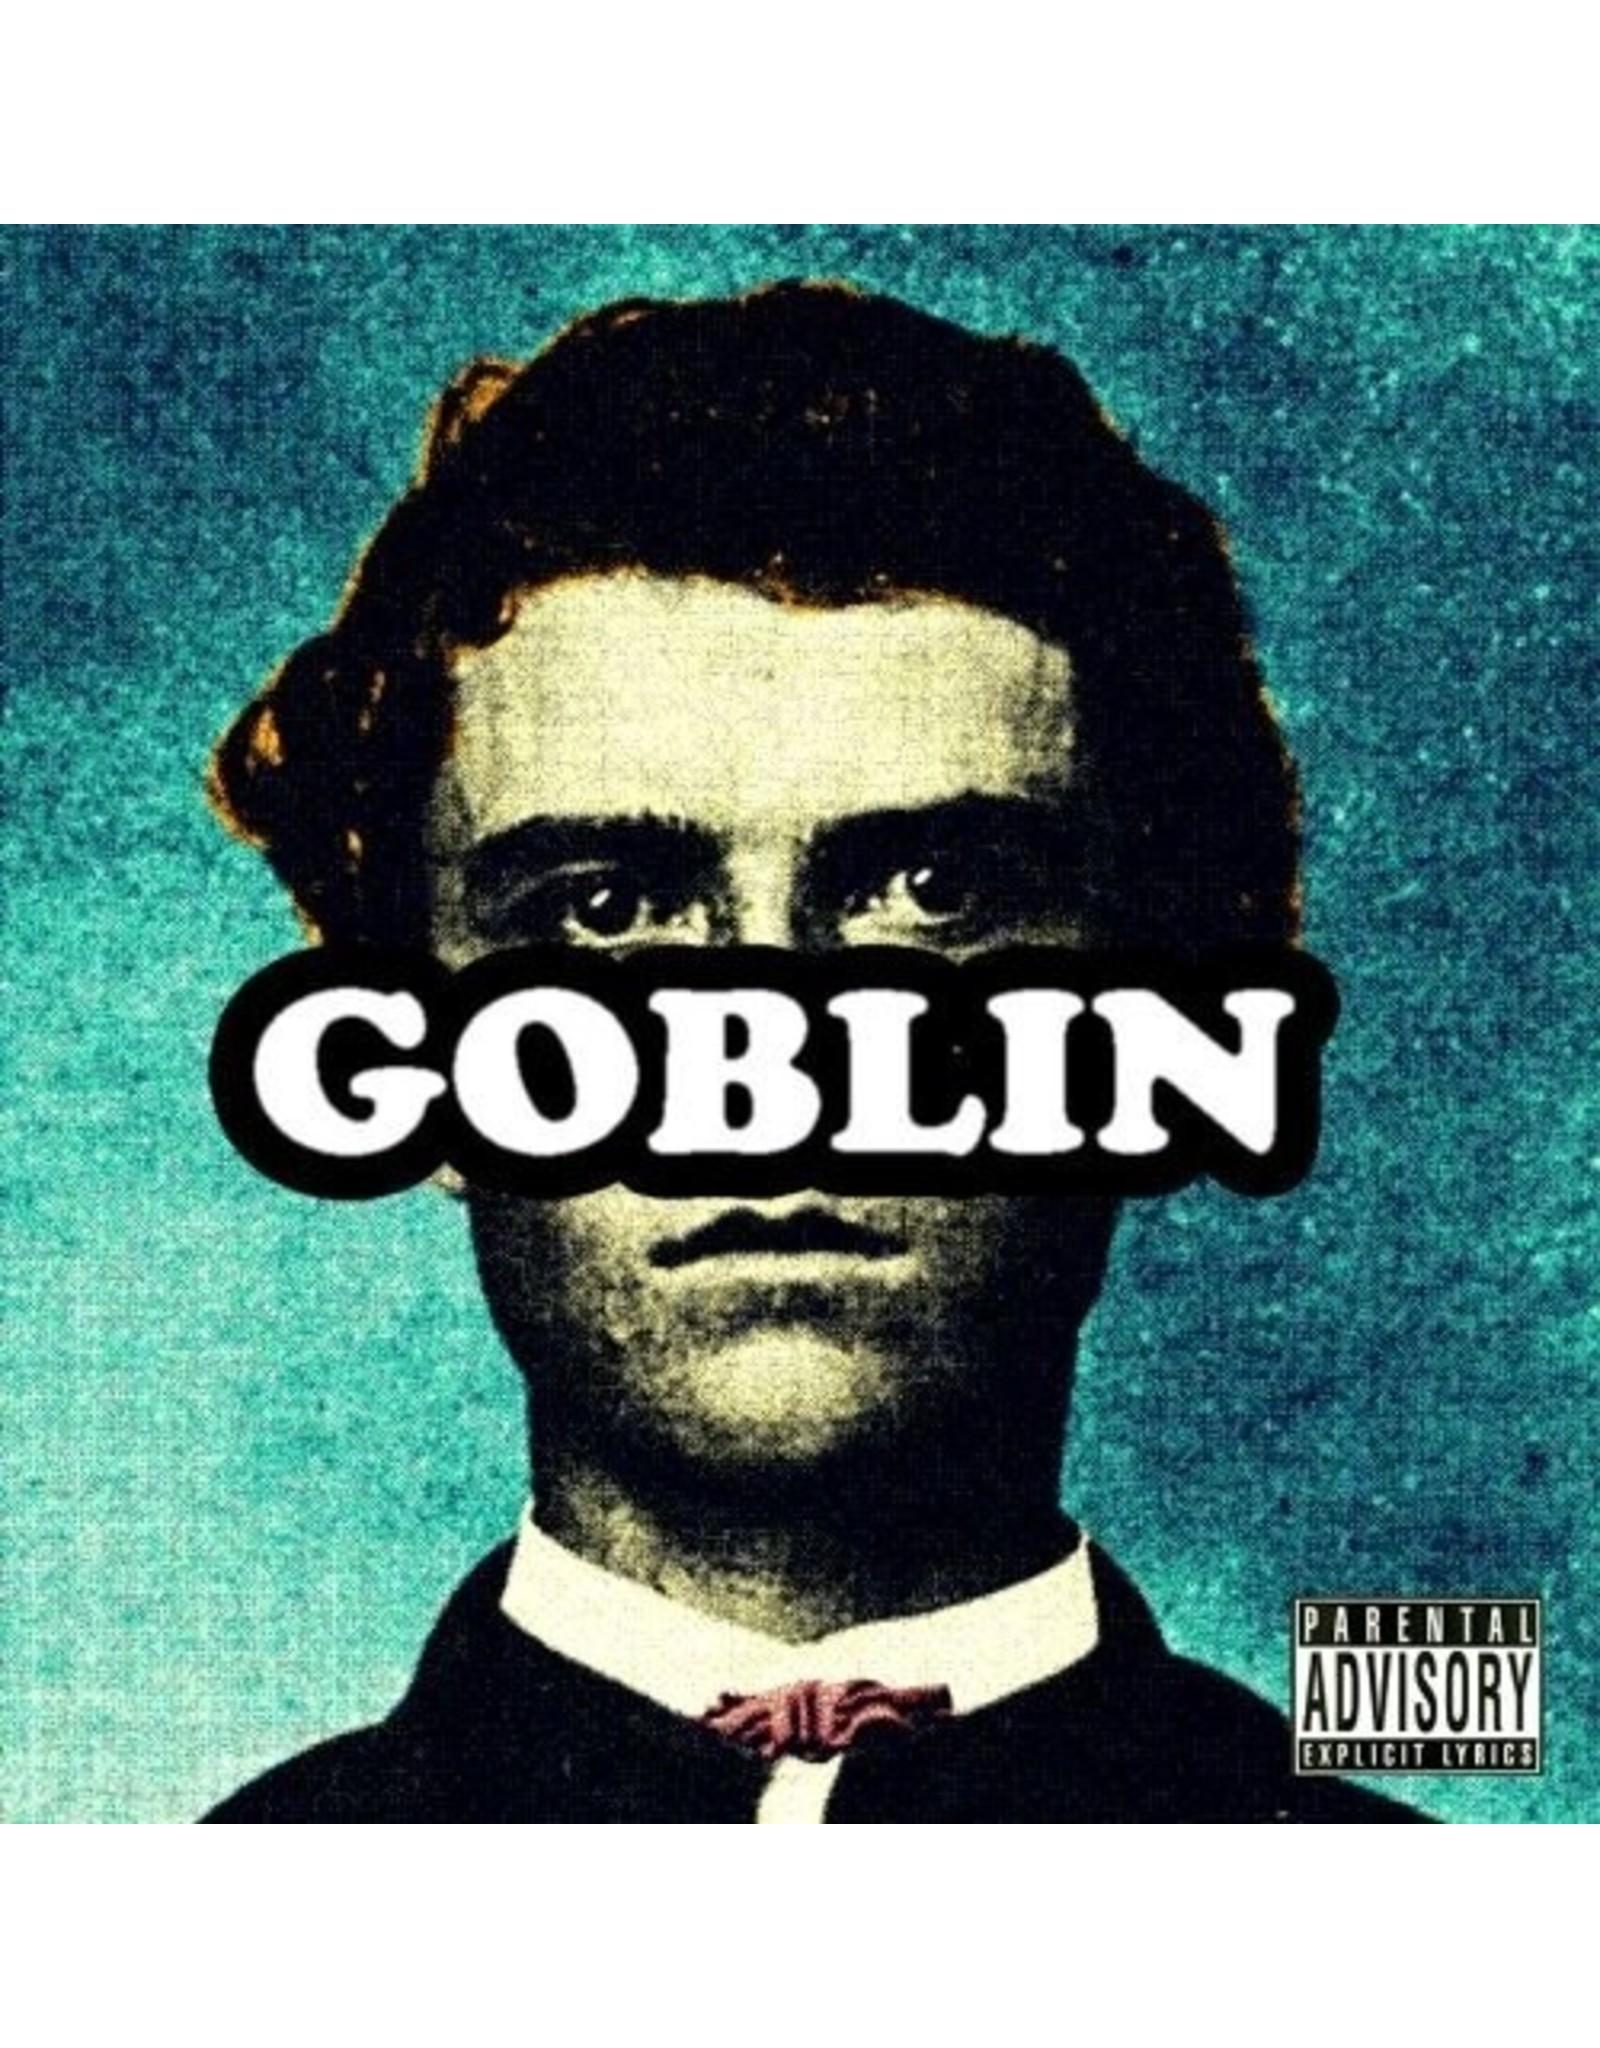 New Vinyl Tyler The Creator - Goblin 2LP